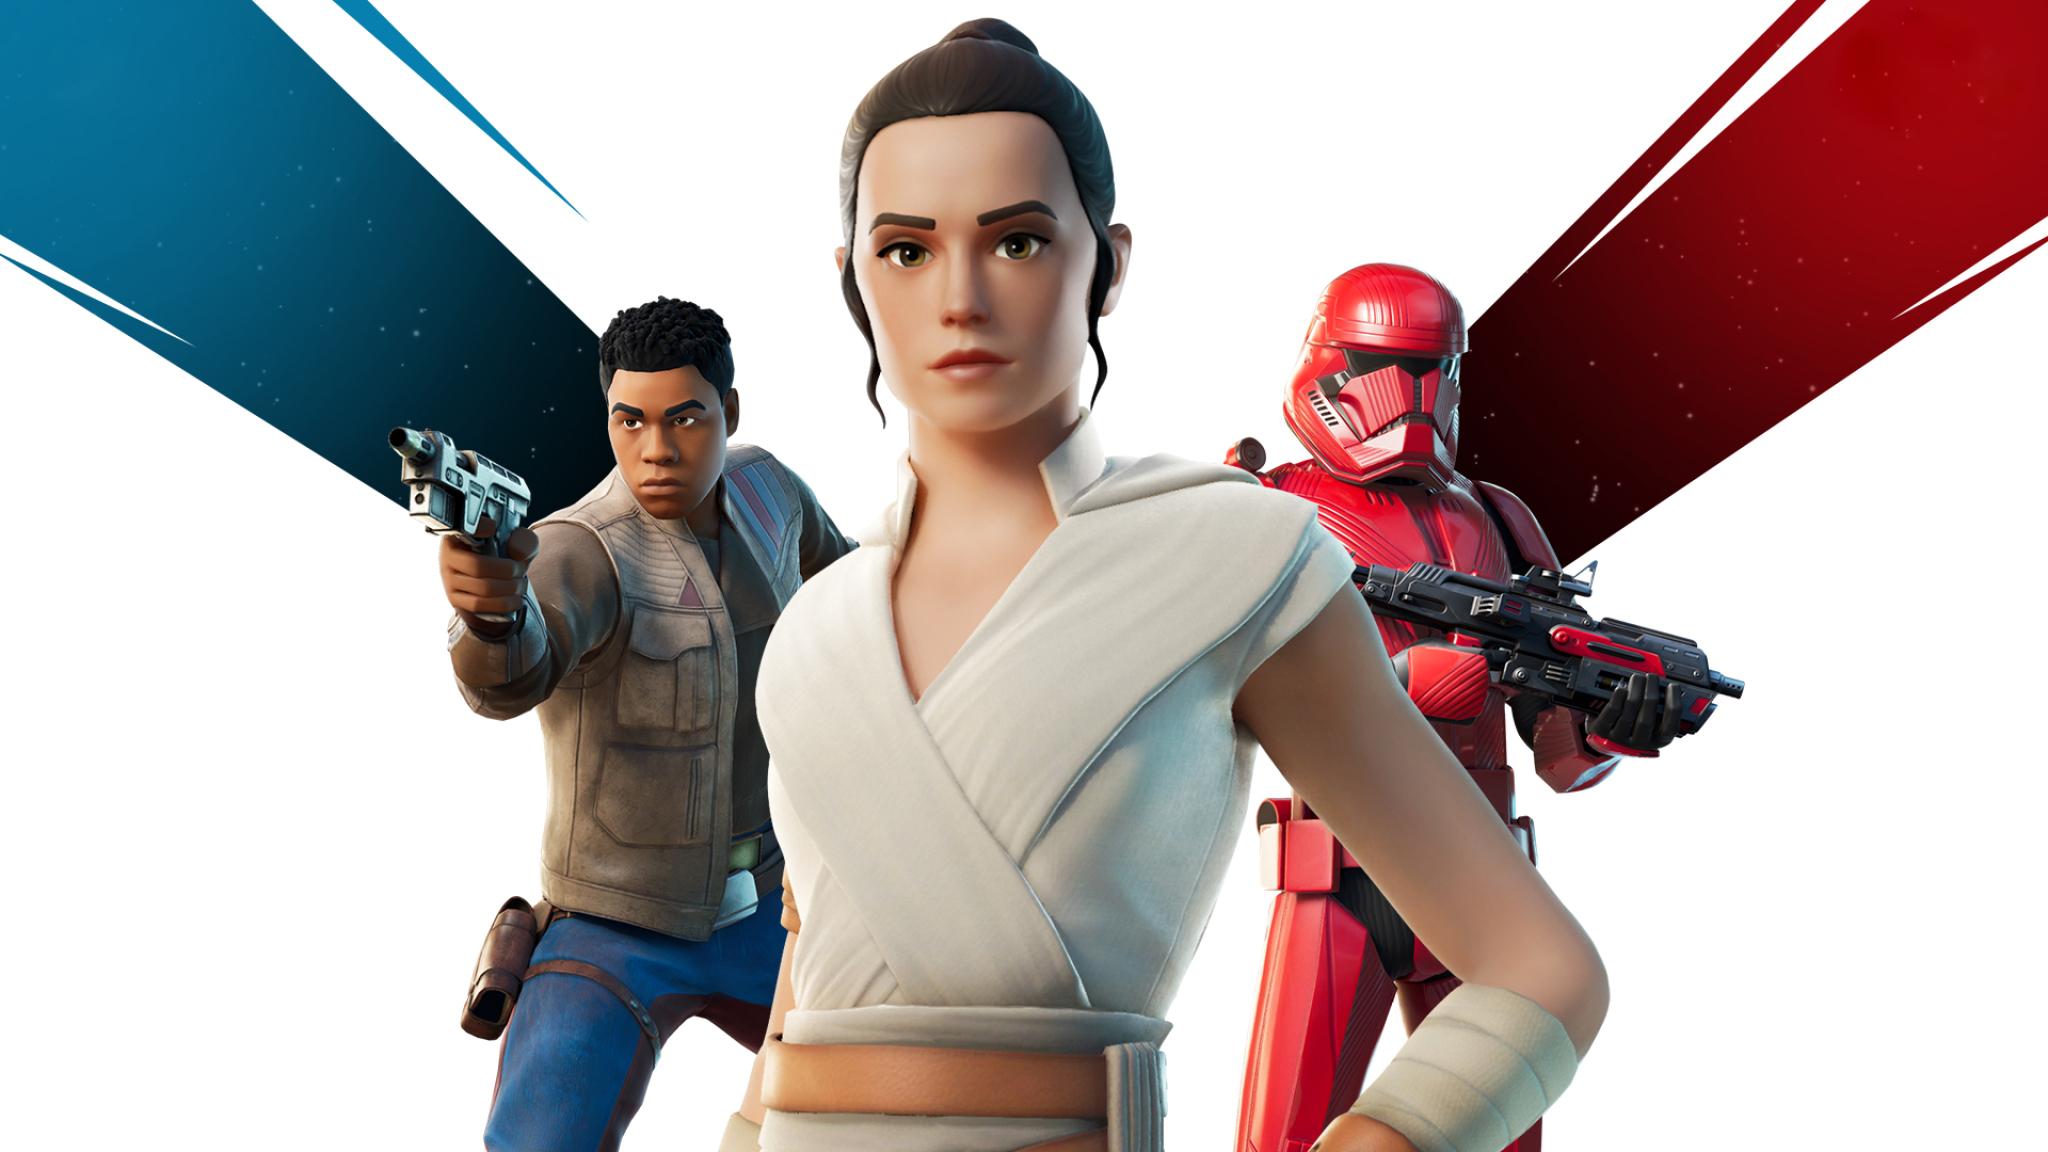 2048x1152 Fortnite Star Wars 9 Rise Of Skywalker 2048x1152